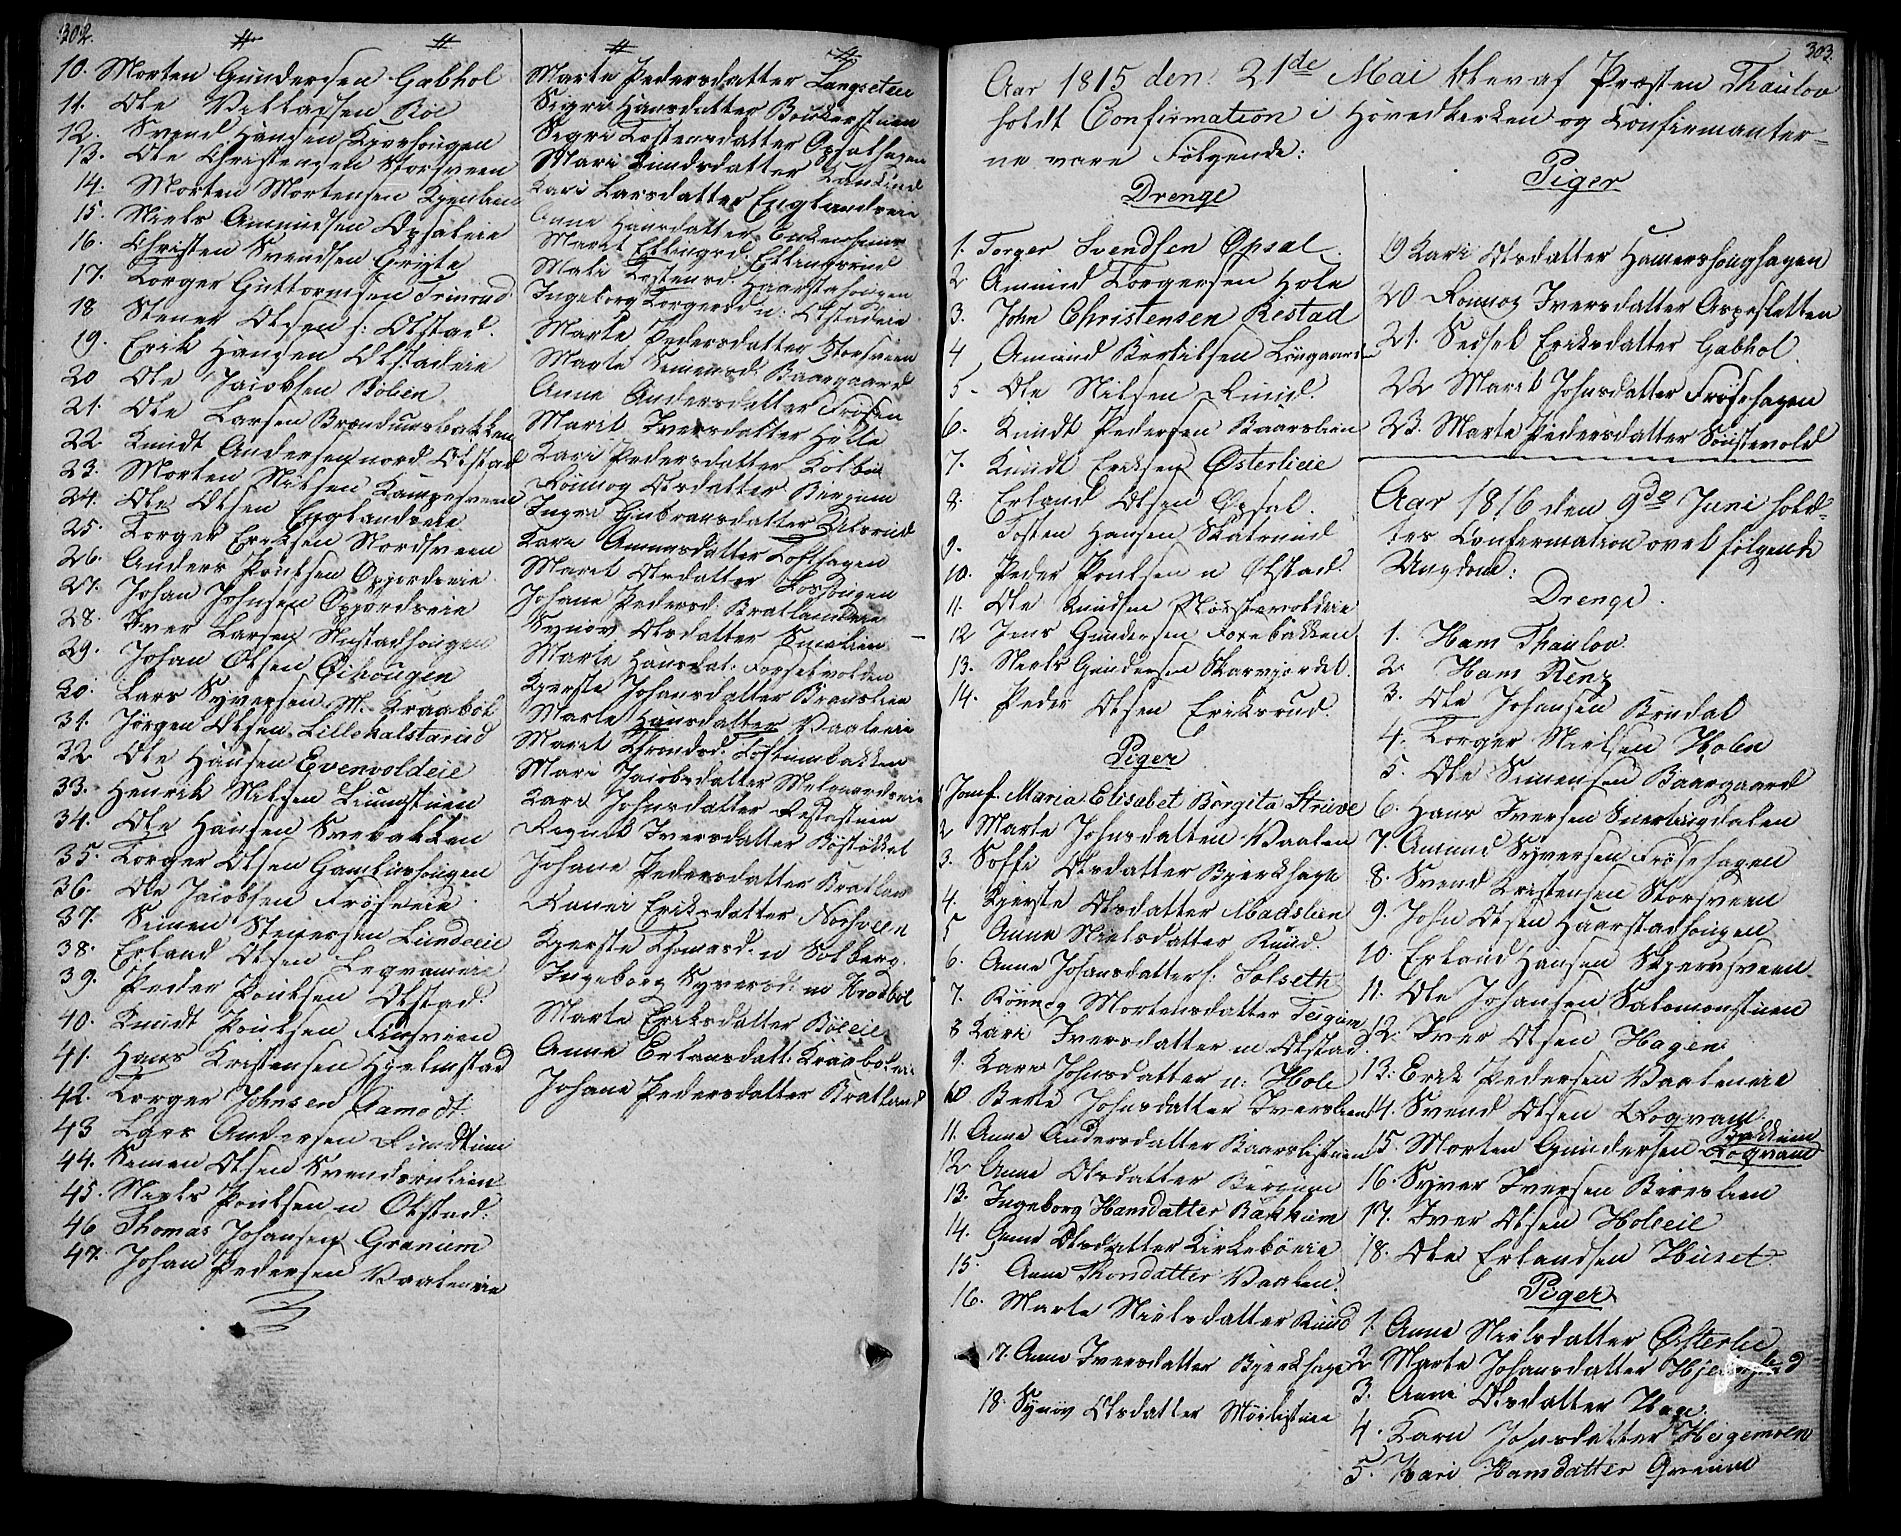 SAH, Gausdal prestekontor, Ministerialbok nr. 4, 1809-1817, s. 302-303